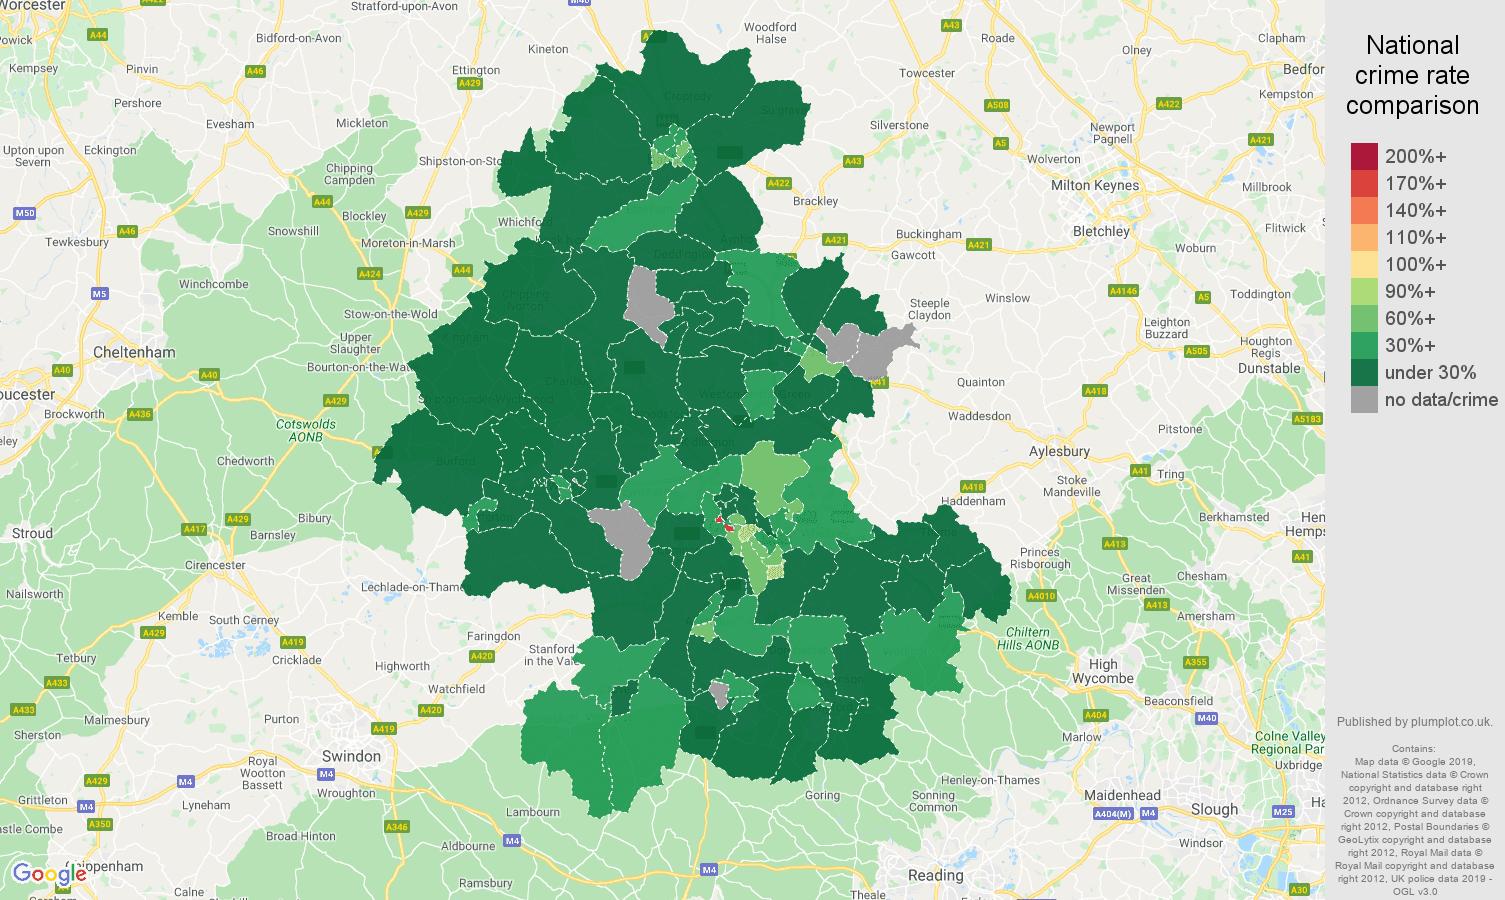 Oxford public order crime rate comparison map